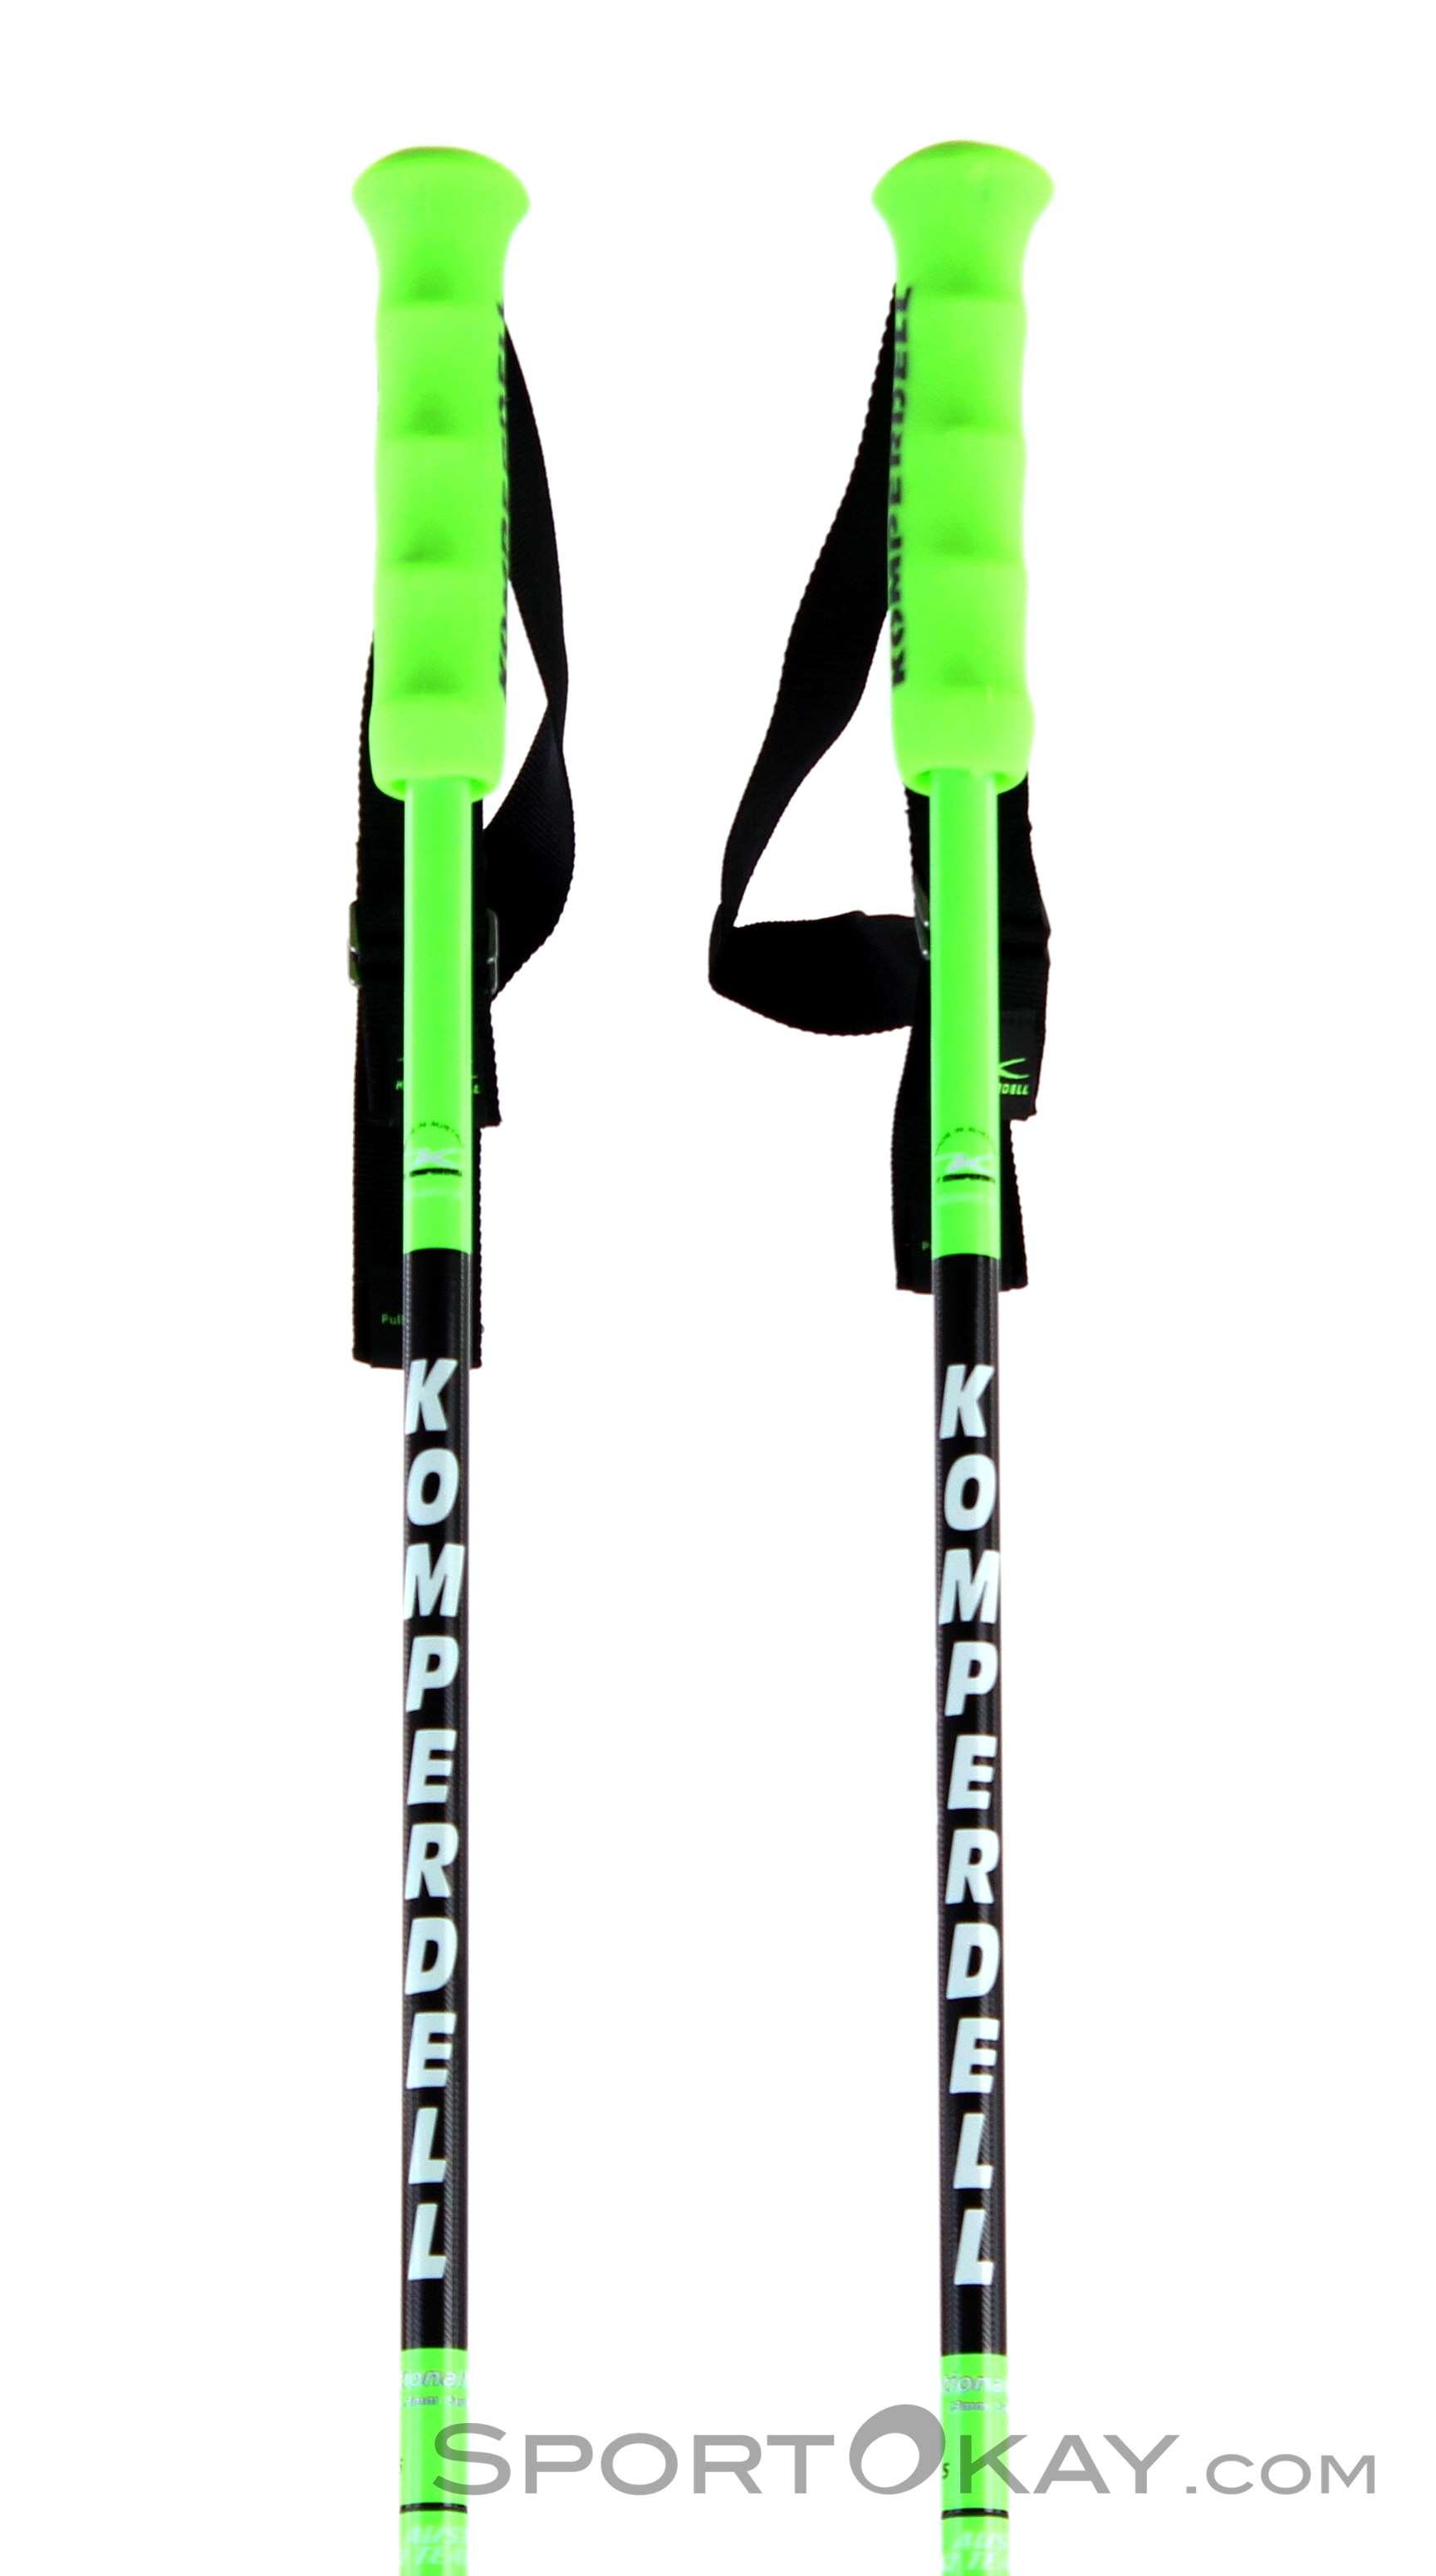 Komperdell Nationalteam Carbon Skistöcke-Grün-135